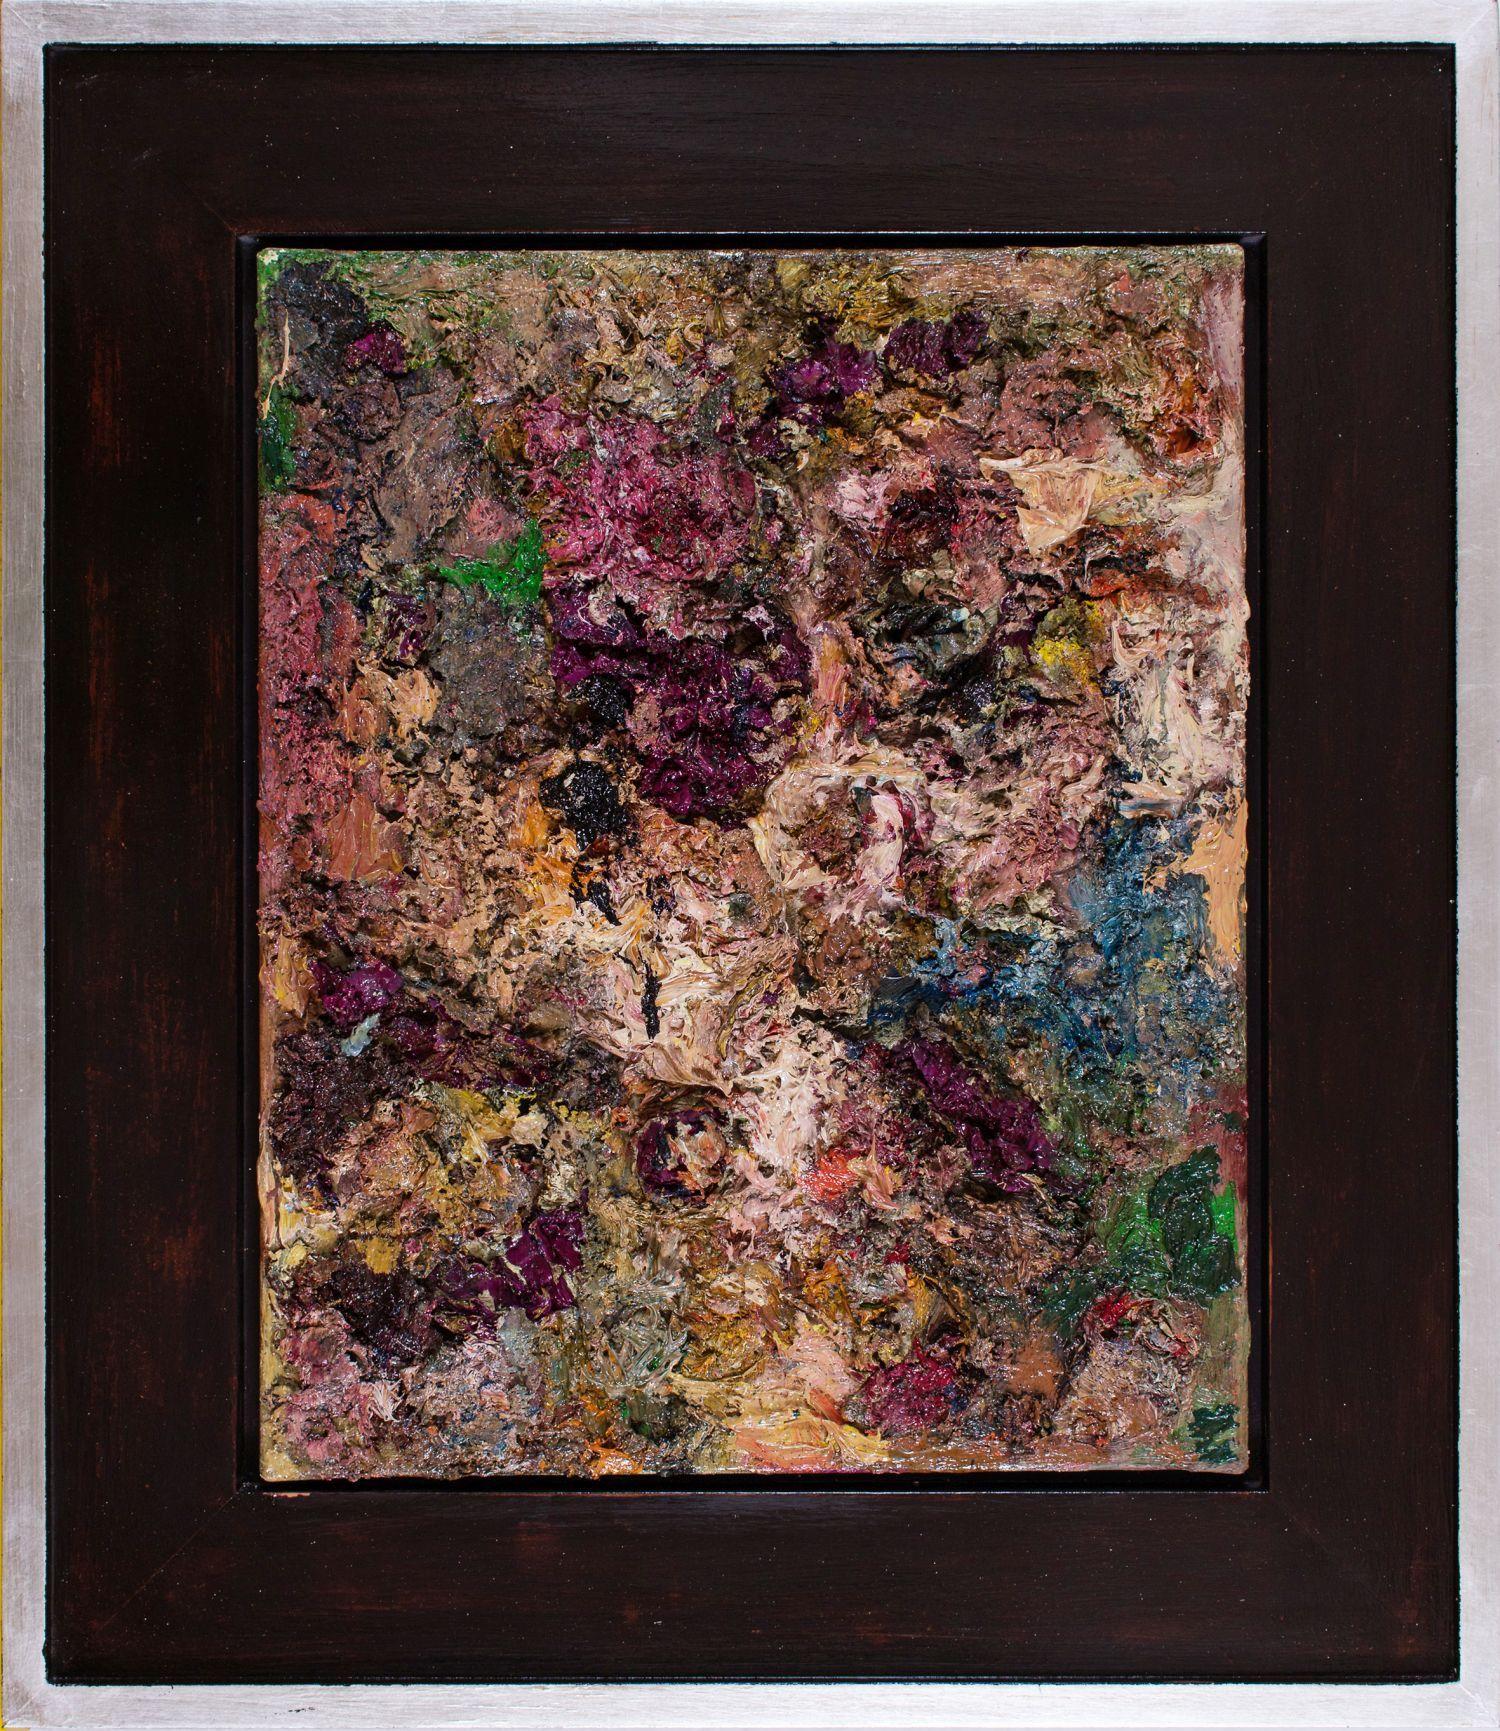 O.T. 1997 Öl auf Leinwand 53 x 43 cm